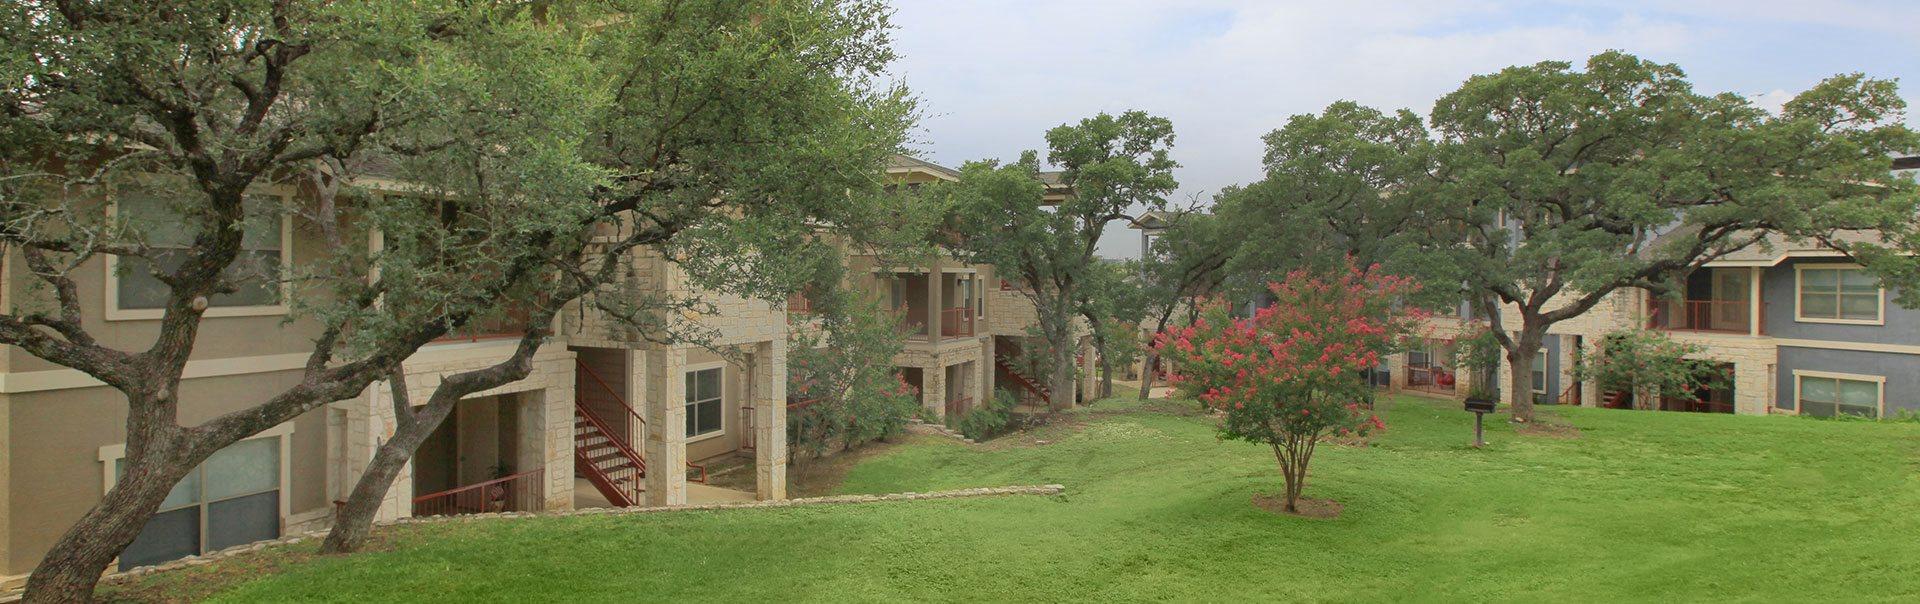 Beautifully-Landscaped Grounds at The Redland,18979 Redland Road San Antonio, TX 78259